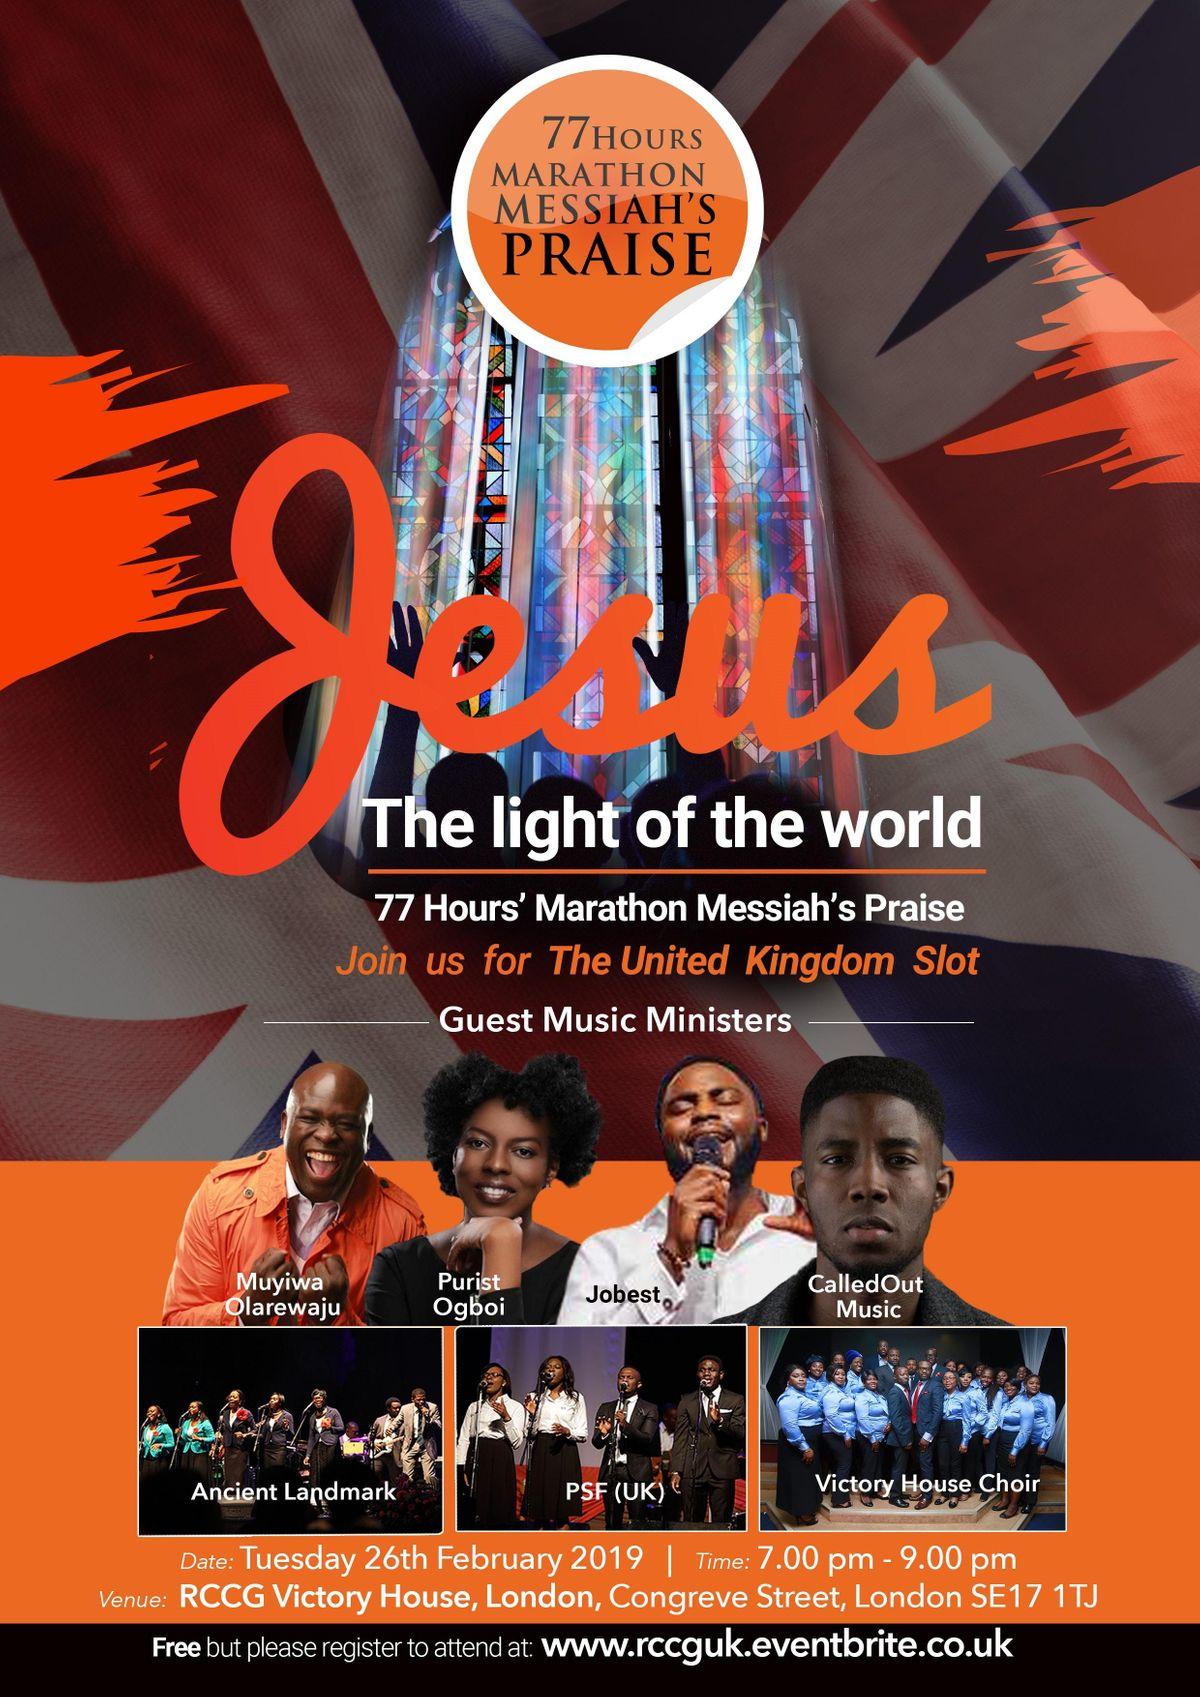 77 Hours Marathon Messiahs Praise: UK Session: Tuesday 26th February